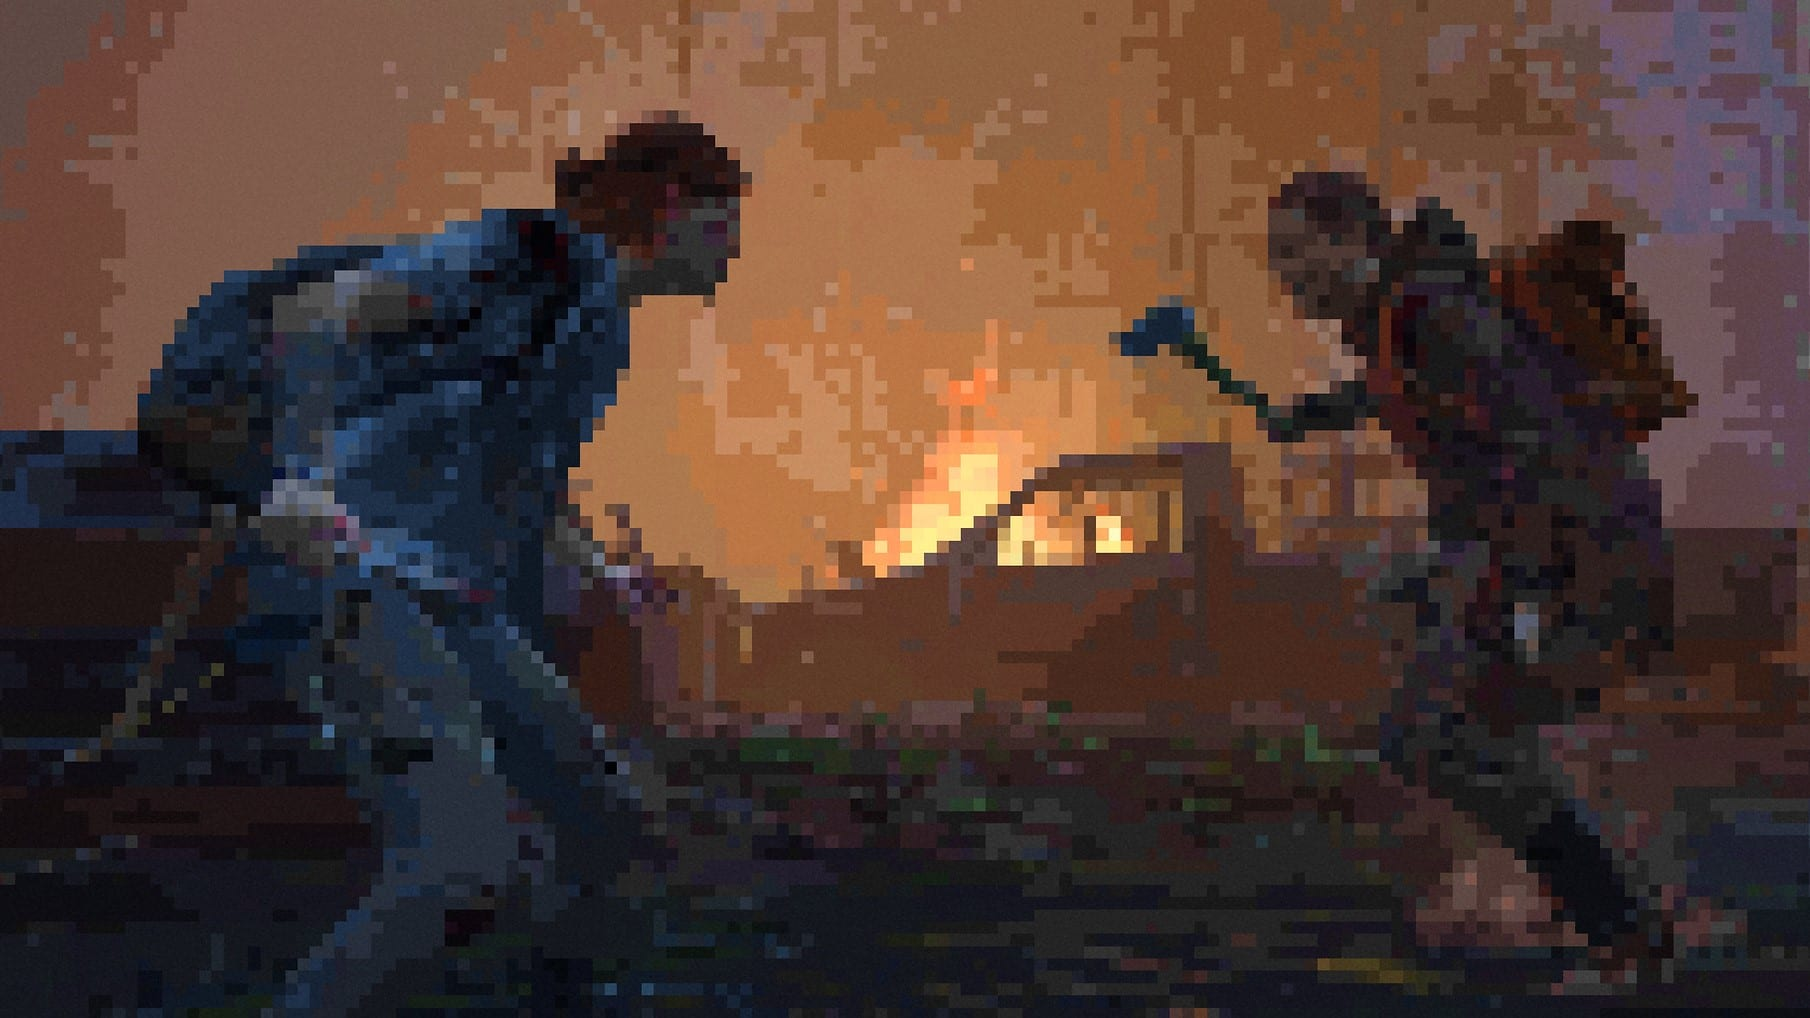 The Last of Us 2 Mod Grafik Pixel Retro